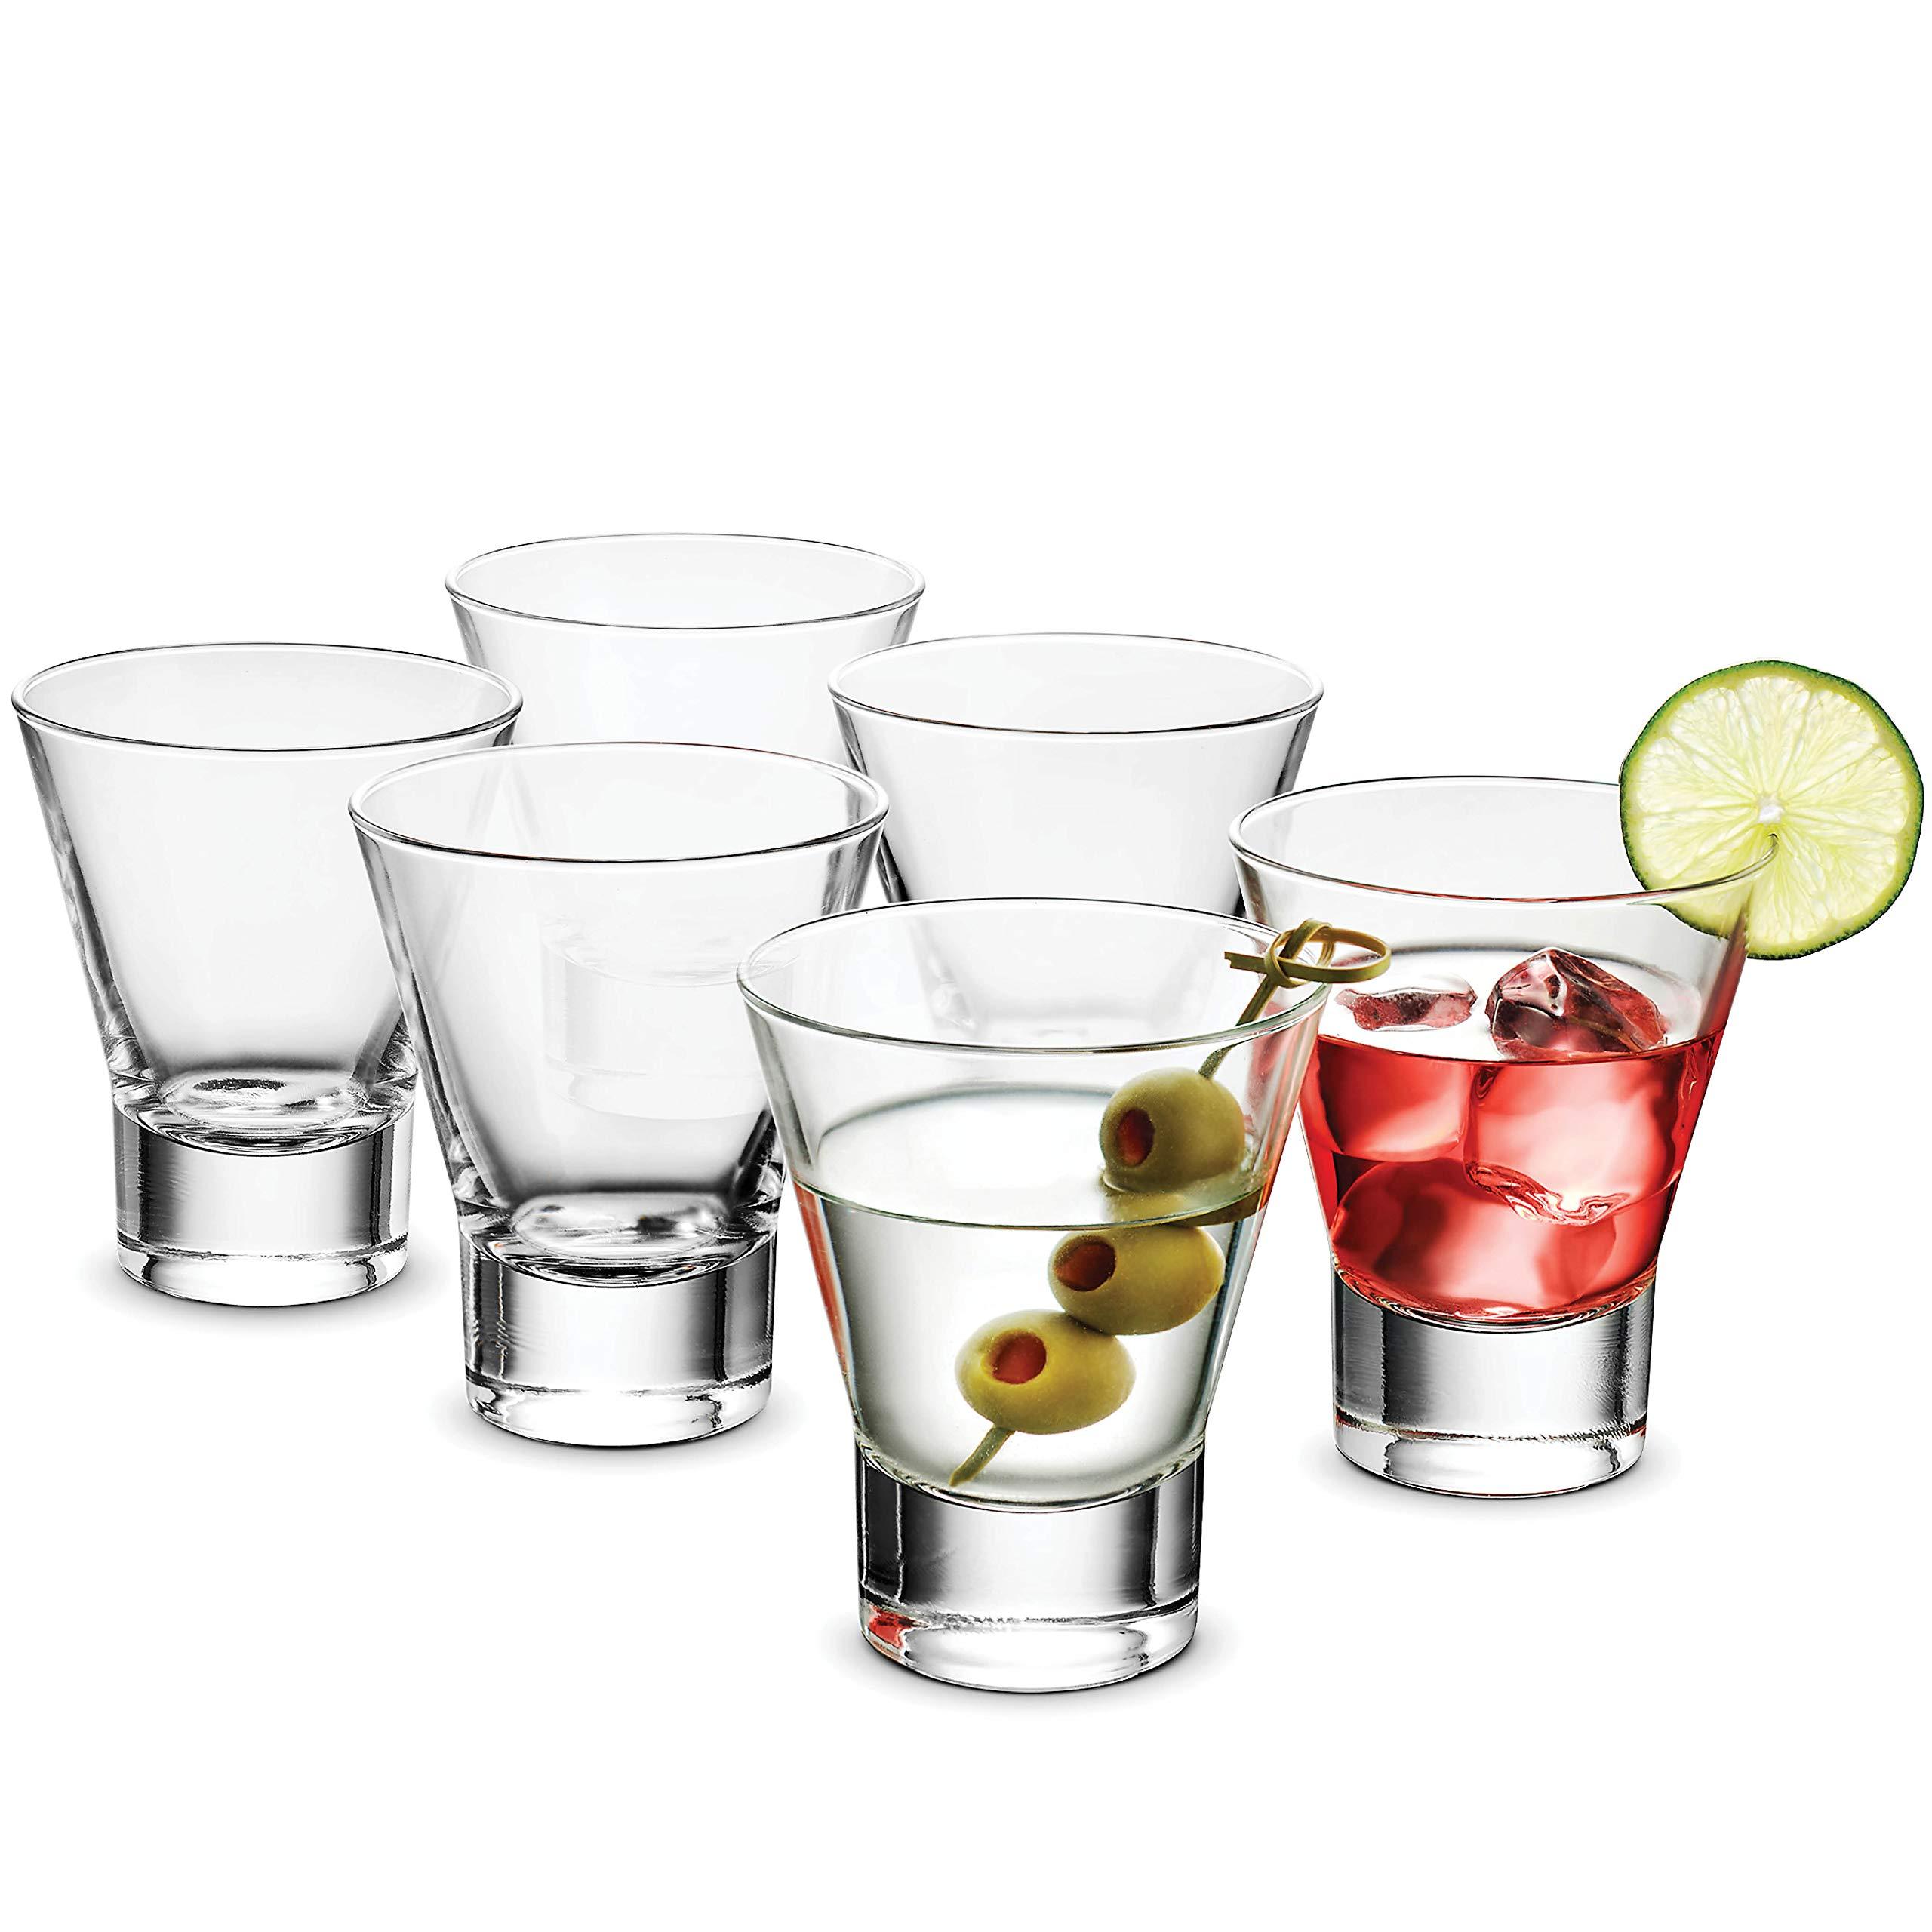 Bormioli Rocco YPSILON Cocktail Glasses set - 8.5 Oz - Bar Glass, (6 Pack) Stemless Martini Glasses for All Alcoholic Beverages like Margarita, Manhattans, Bourbon, Vodka, Lead-Free Whiskey Glass